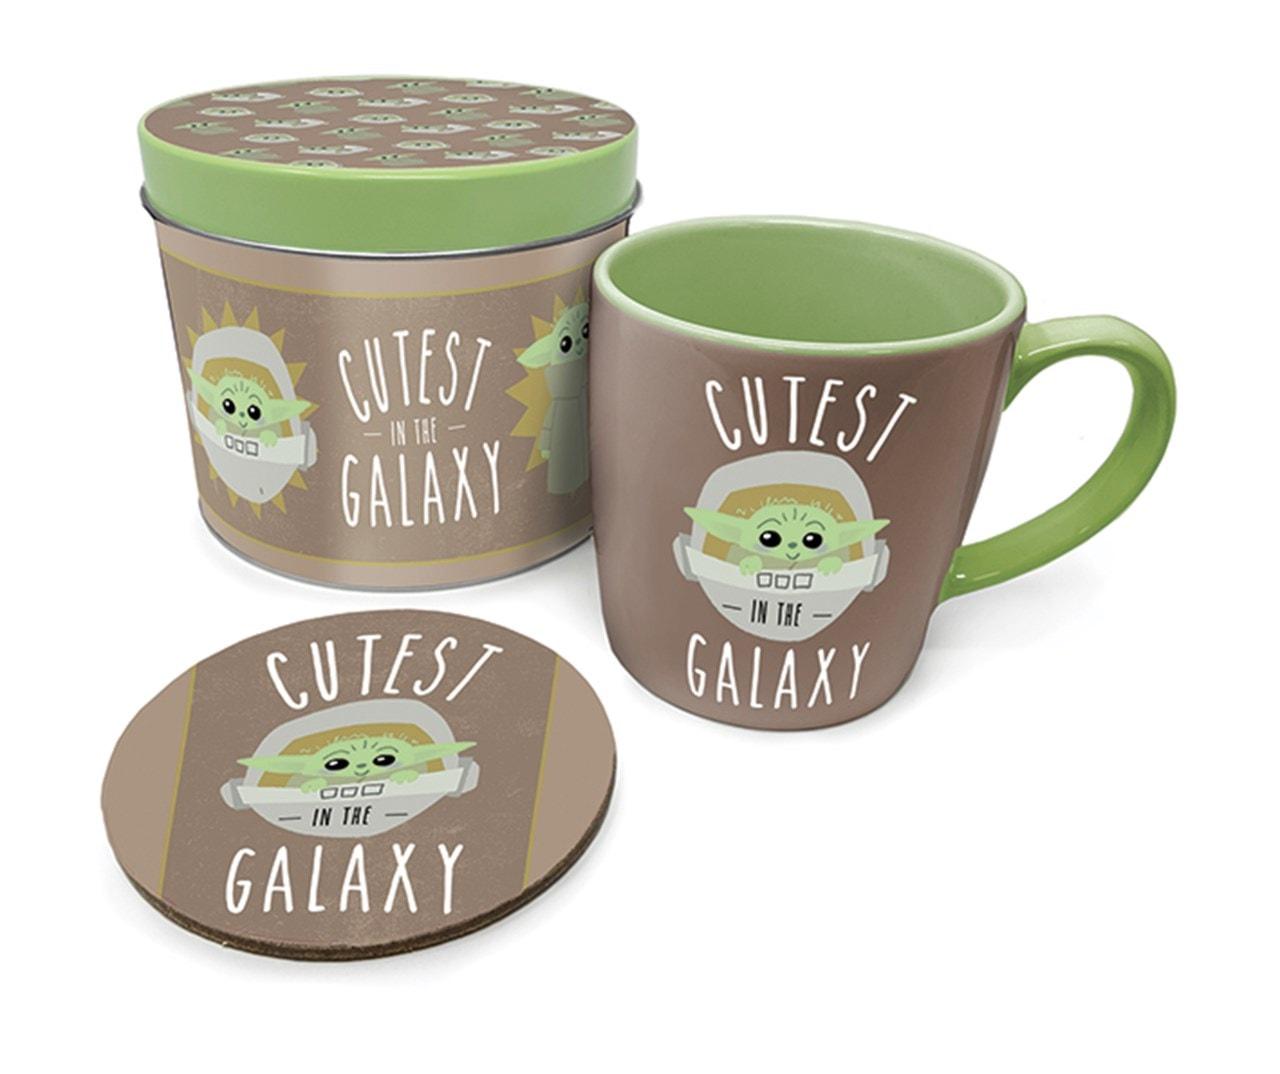 The Mandalorian: Cutest In The Galaxy Mug Gift Set in Tin - 2